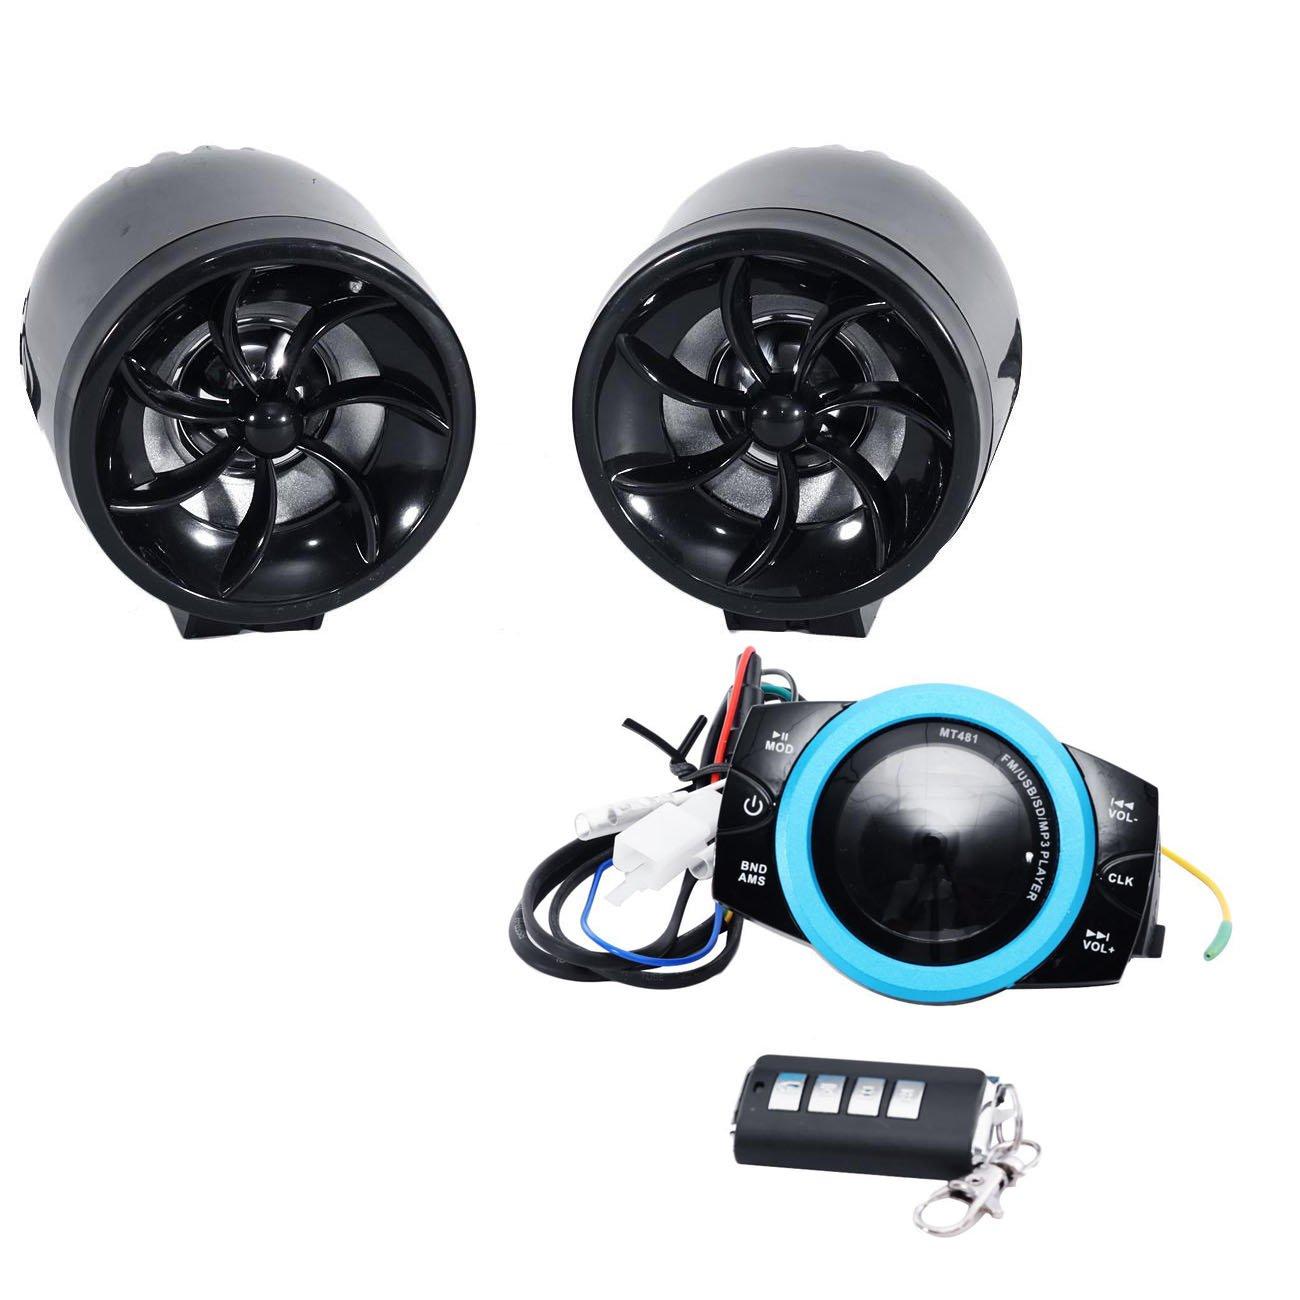 INNOGLOW Motorcycle Universal Audio Radio Handlebar Amplifier Stereo Speaker System FM MP3 2 LED Speakers 1 audio system